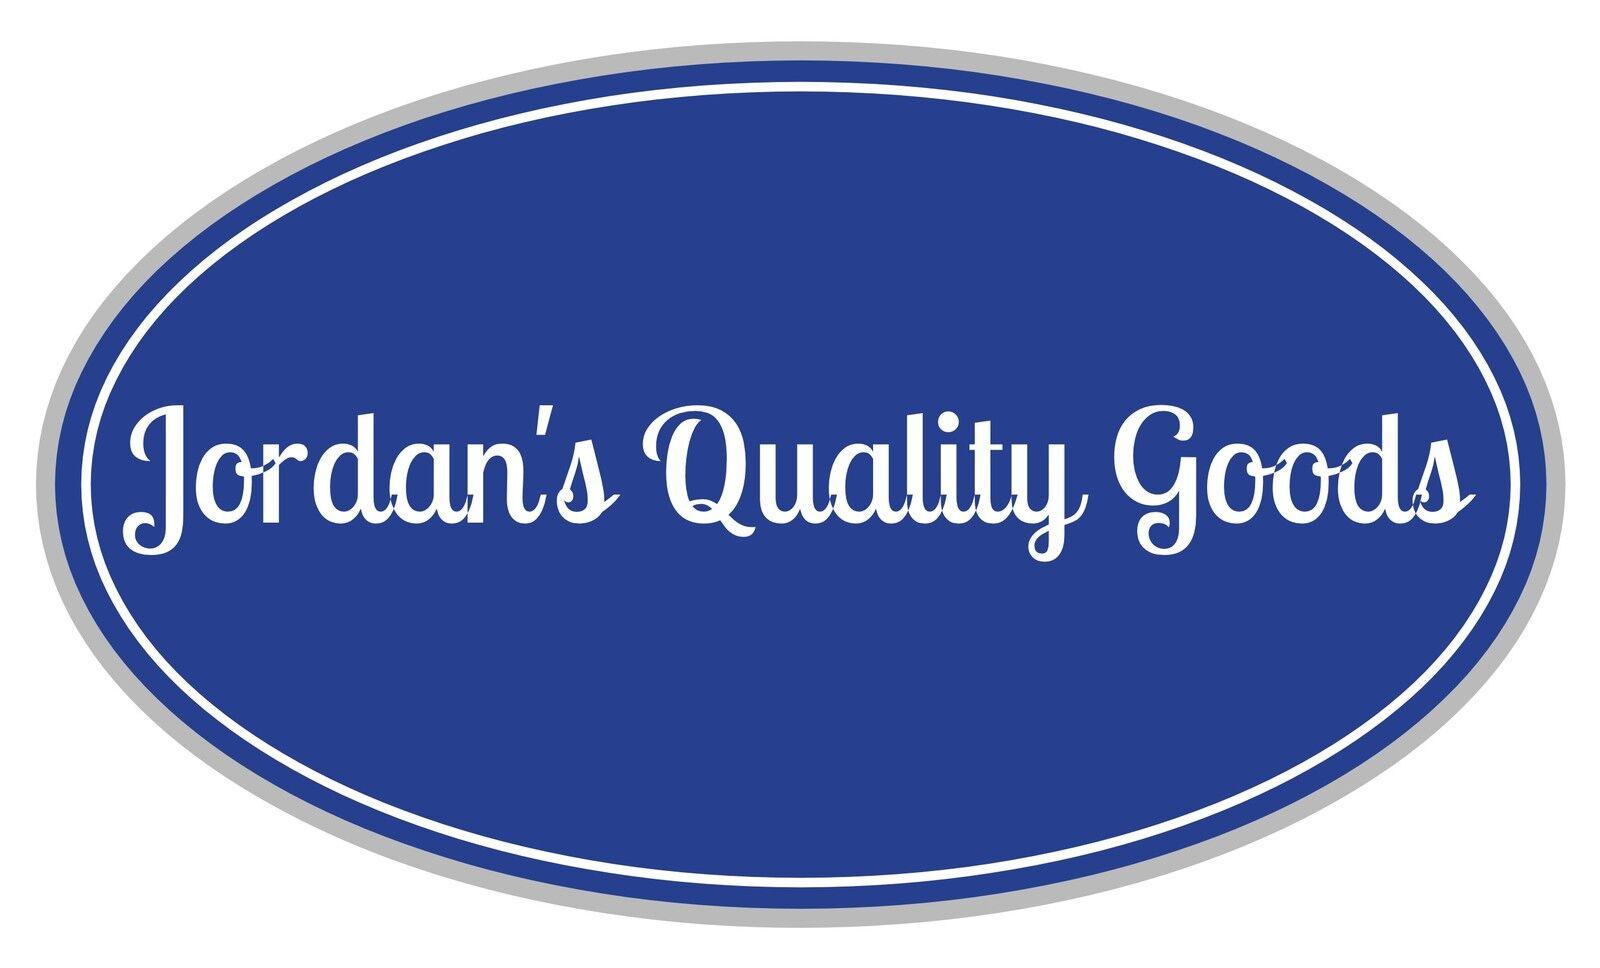 Jordan's Quality Goods